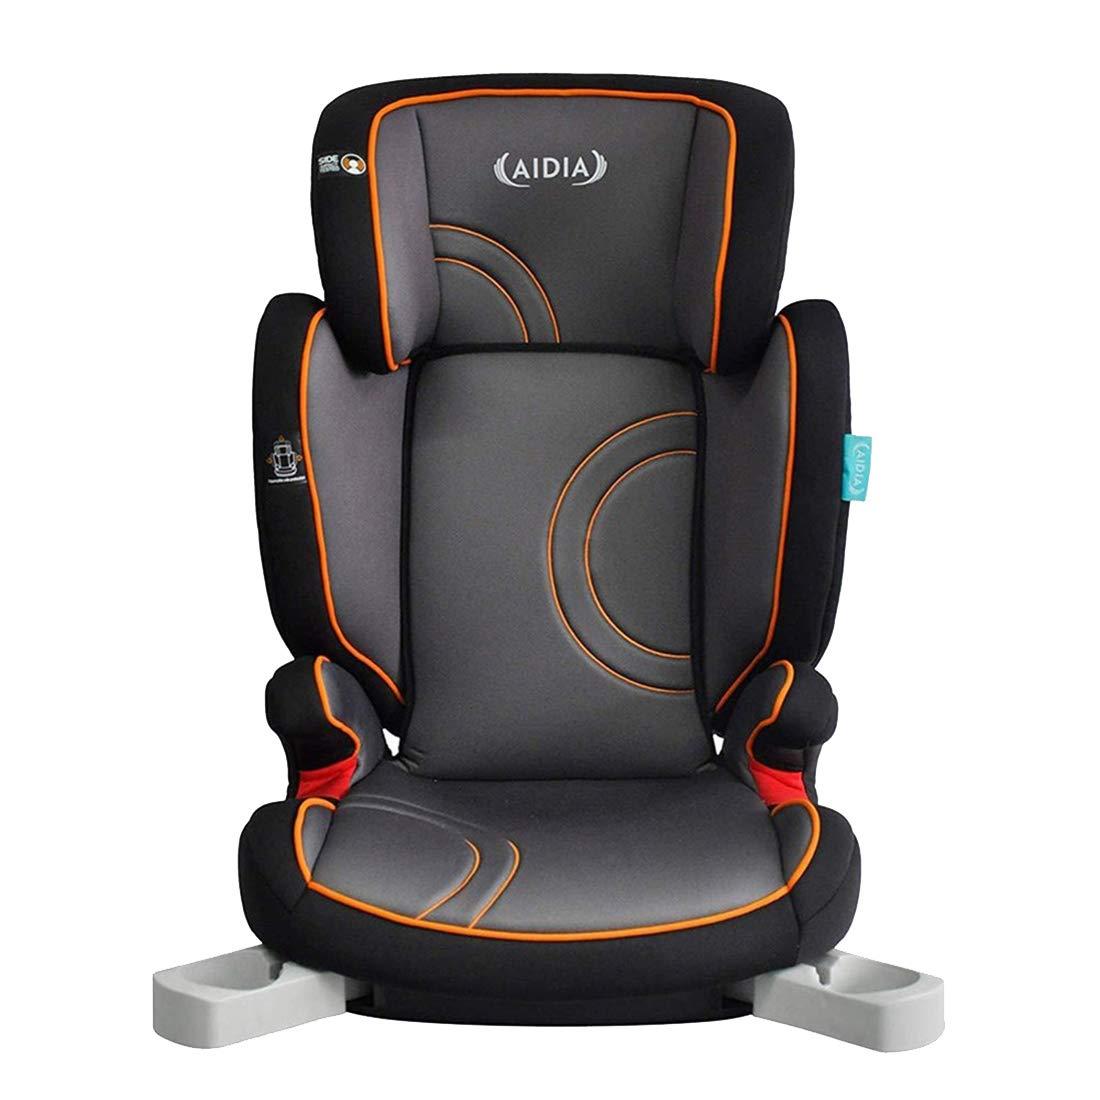 Aidia Pathfinder High Back Safety Booster Car Seat, Grey/Black AD03-B/Saturn